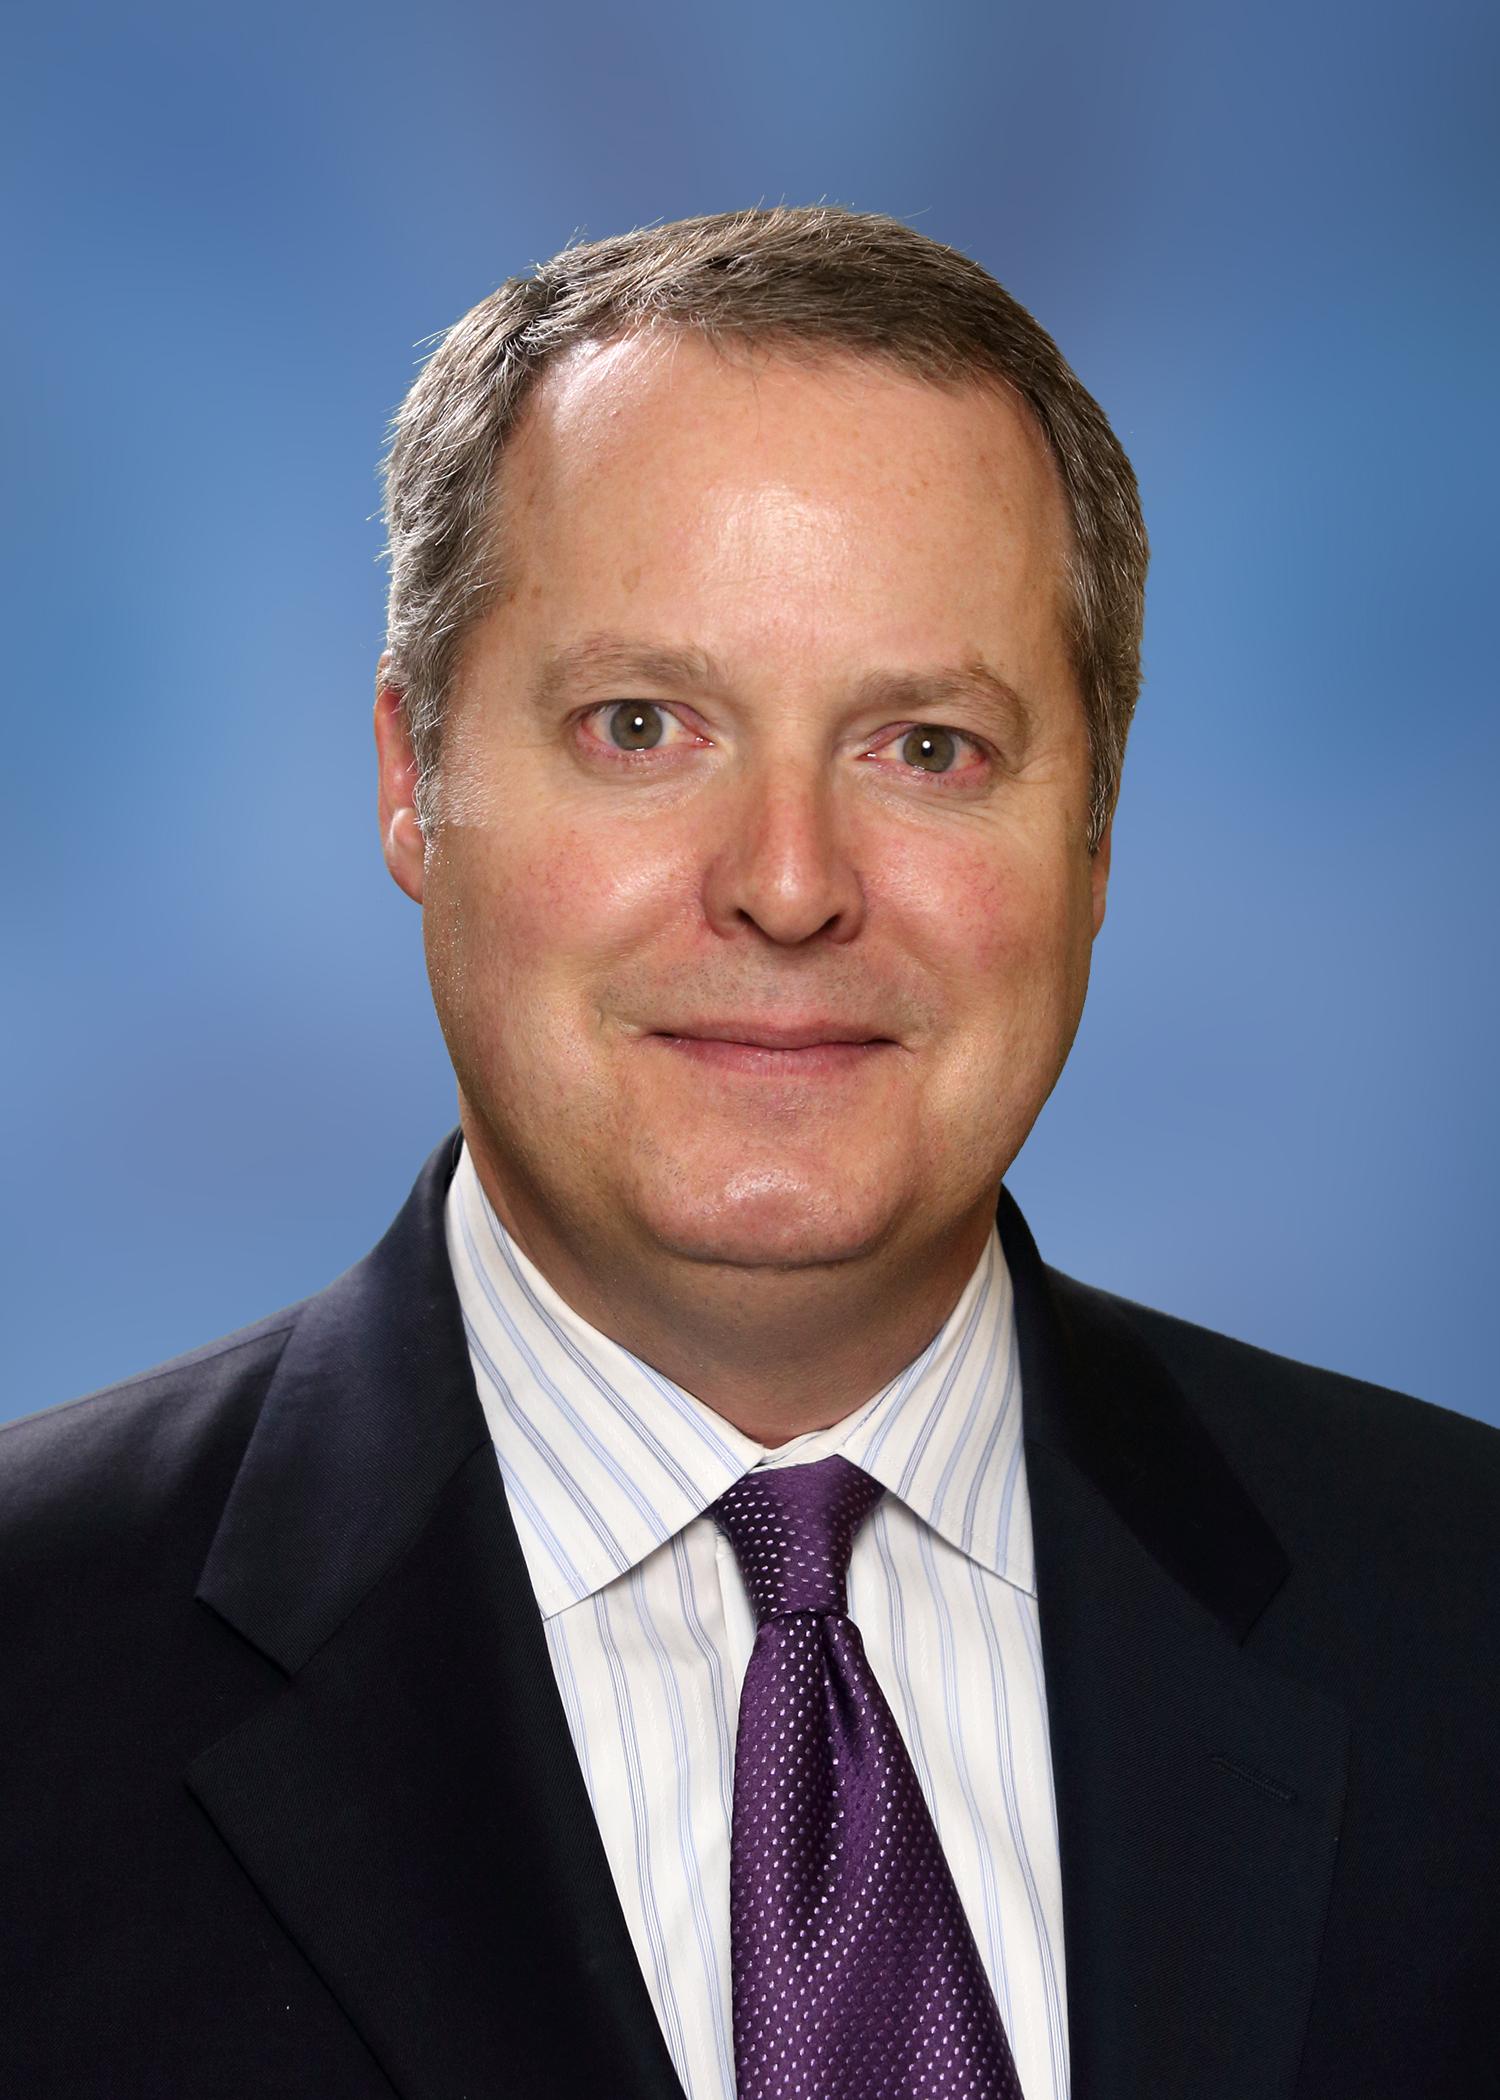 Patrick McNulty Net Worth